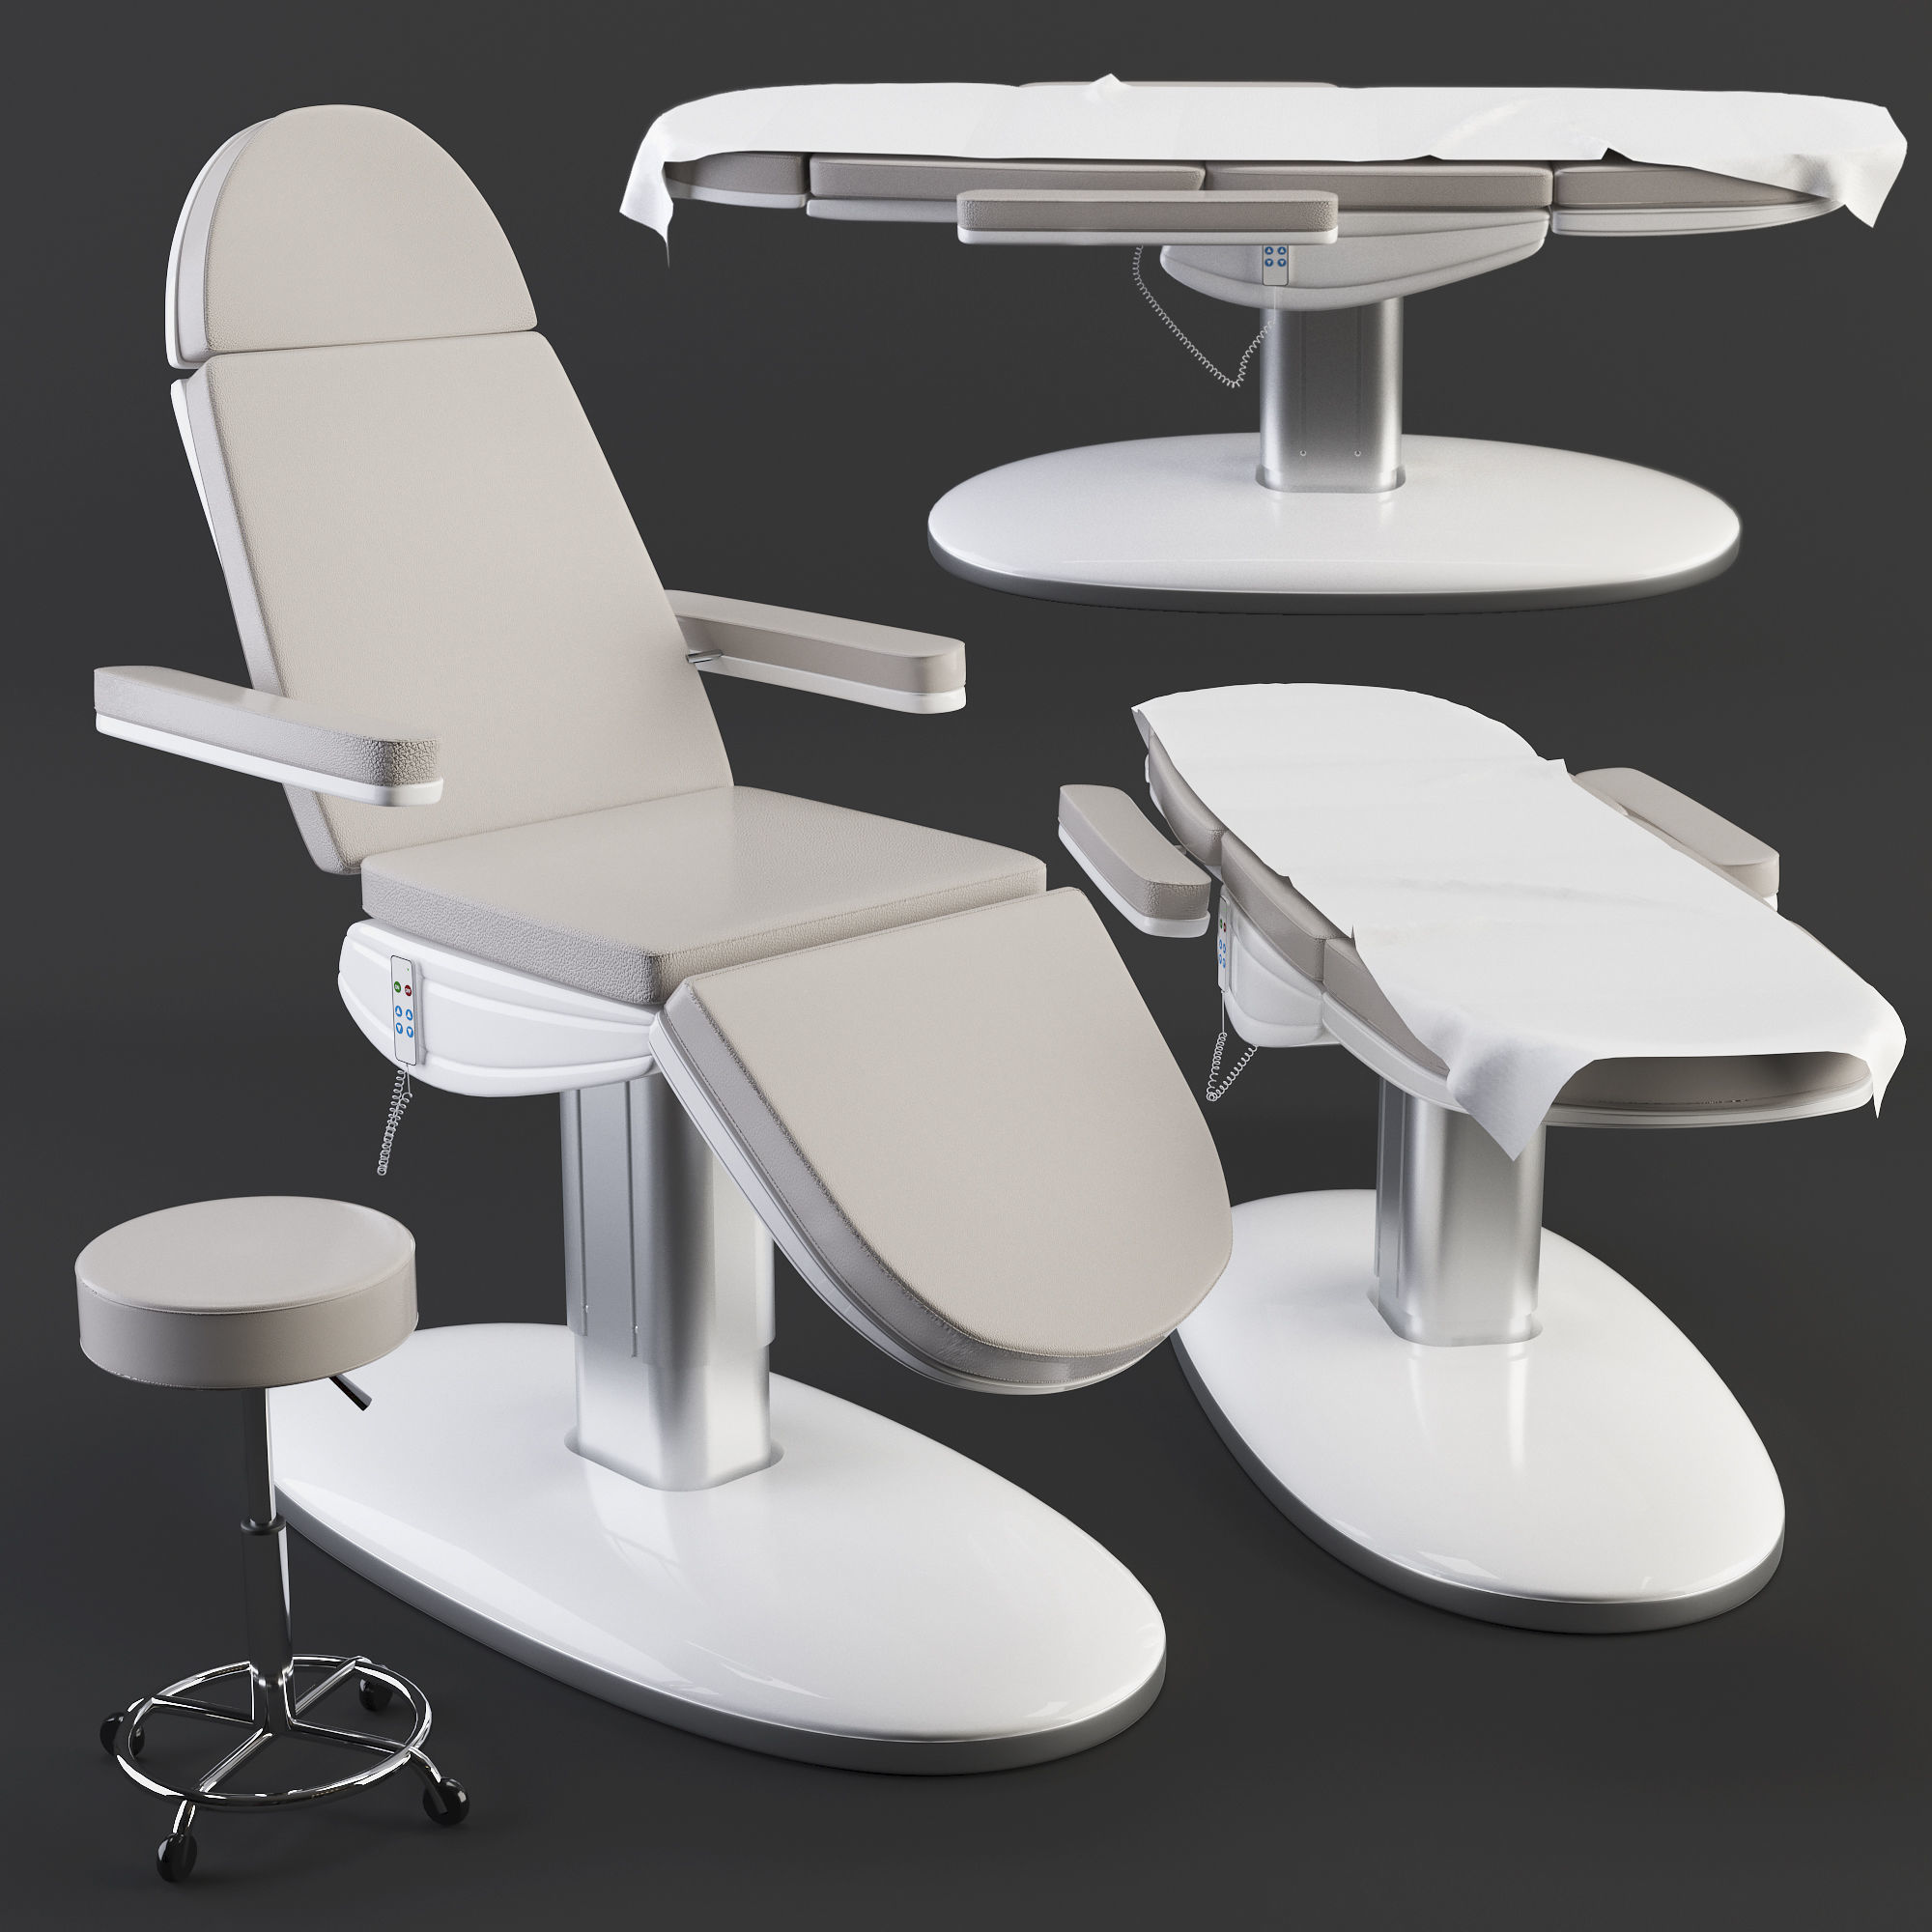 Treatment care table